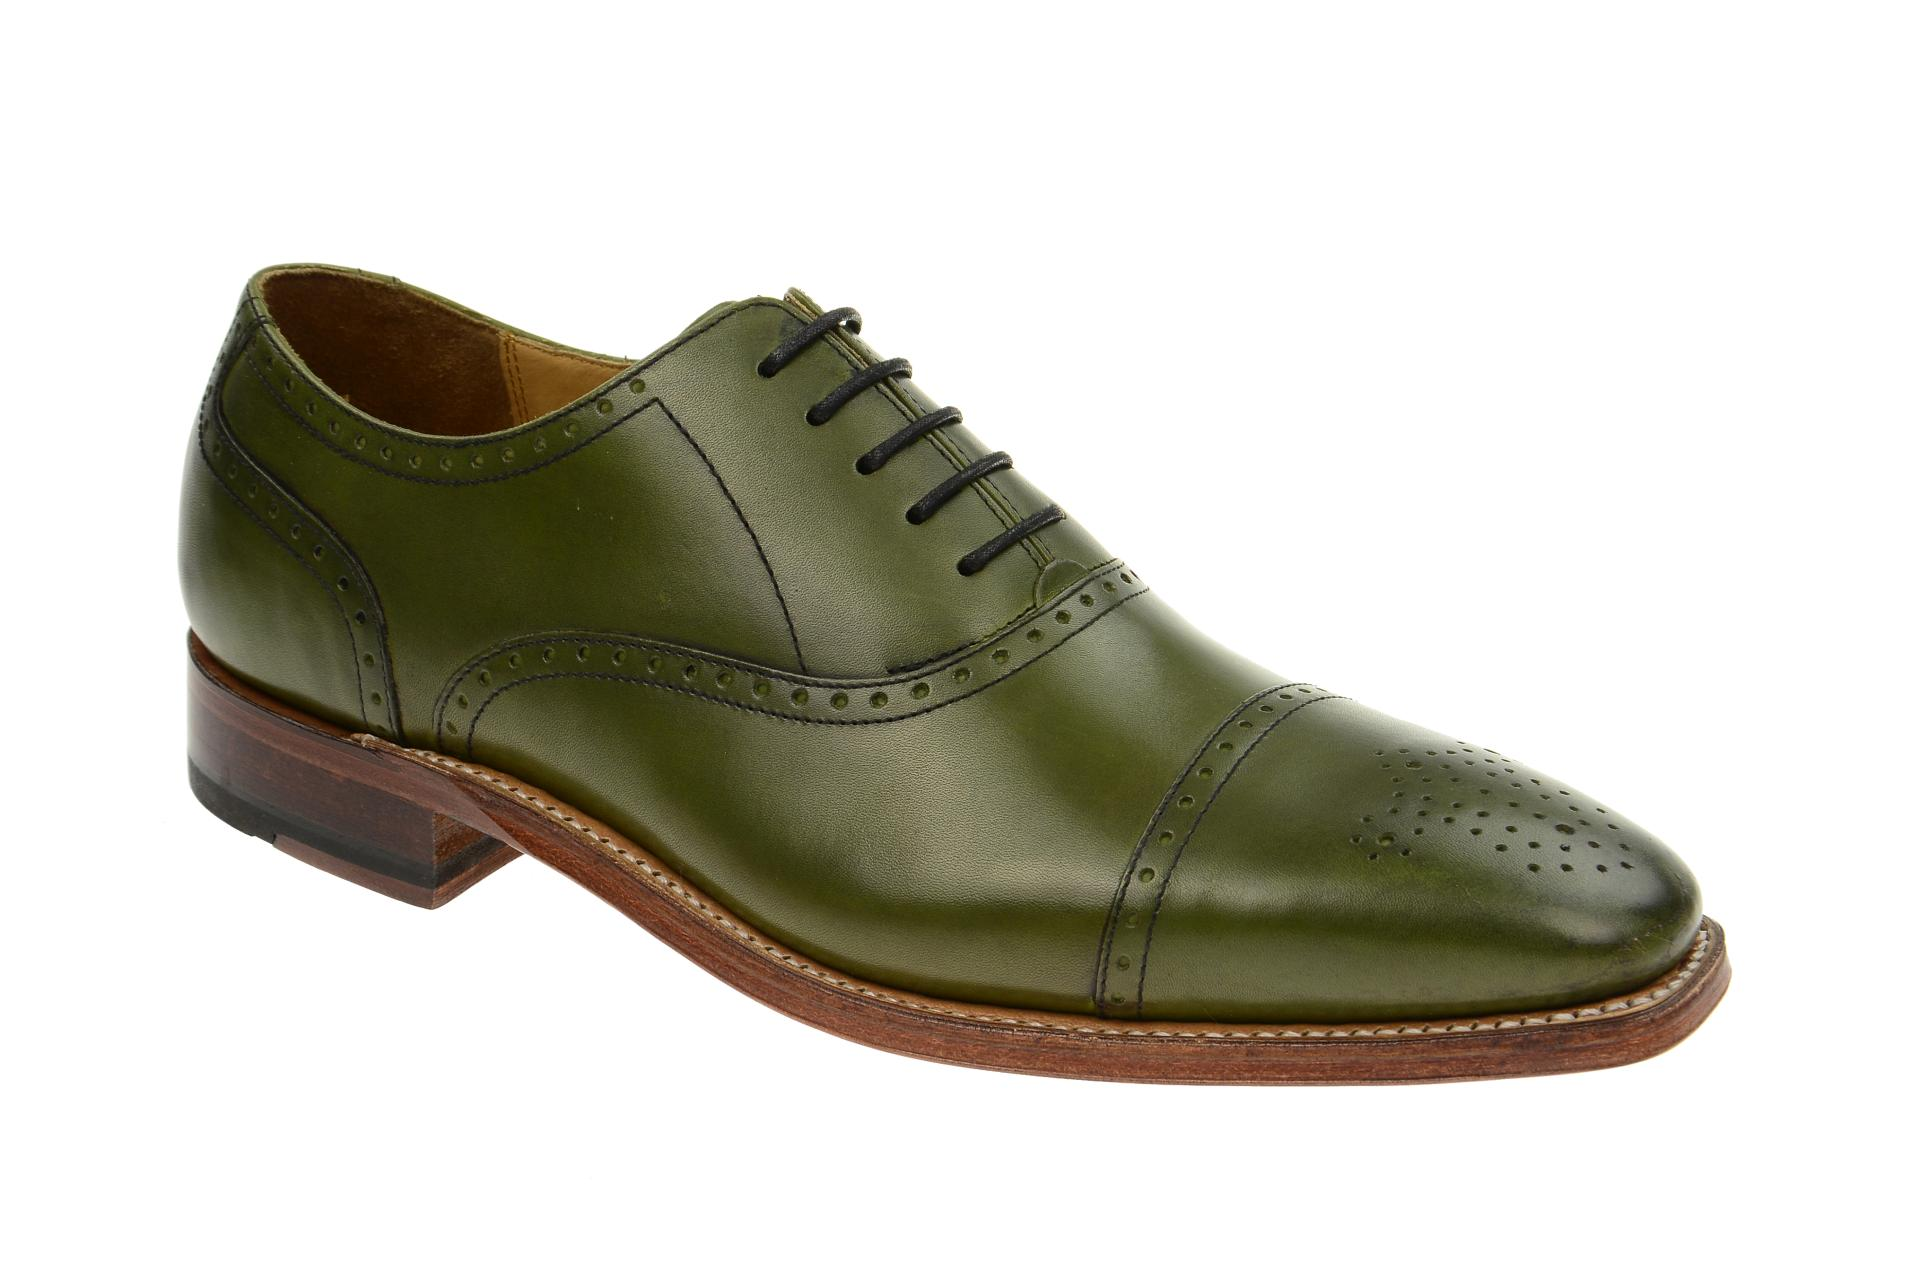 Gordon & Bros. Schuhe 2830 Lucquin grün Rahmengenäht :: Grün - 41 - Männlich - Erwachsene